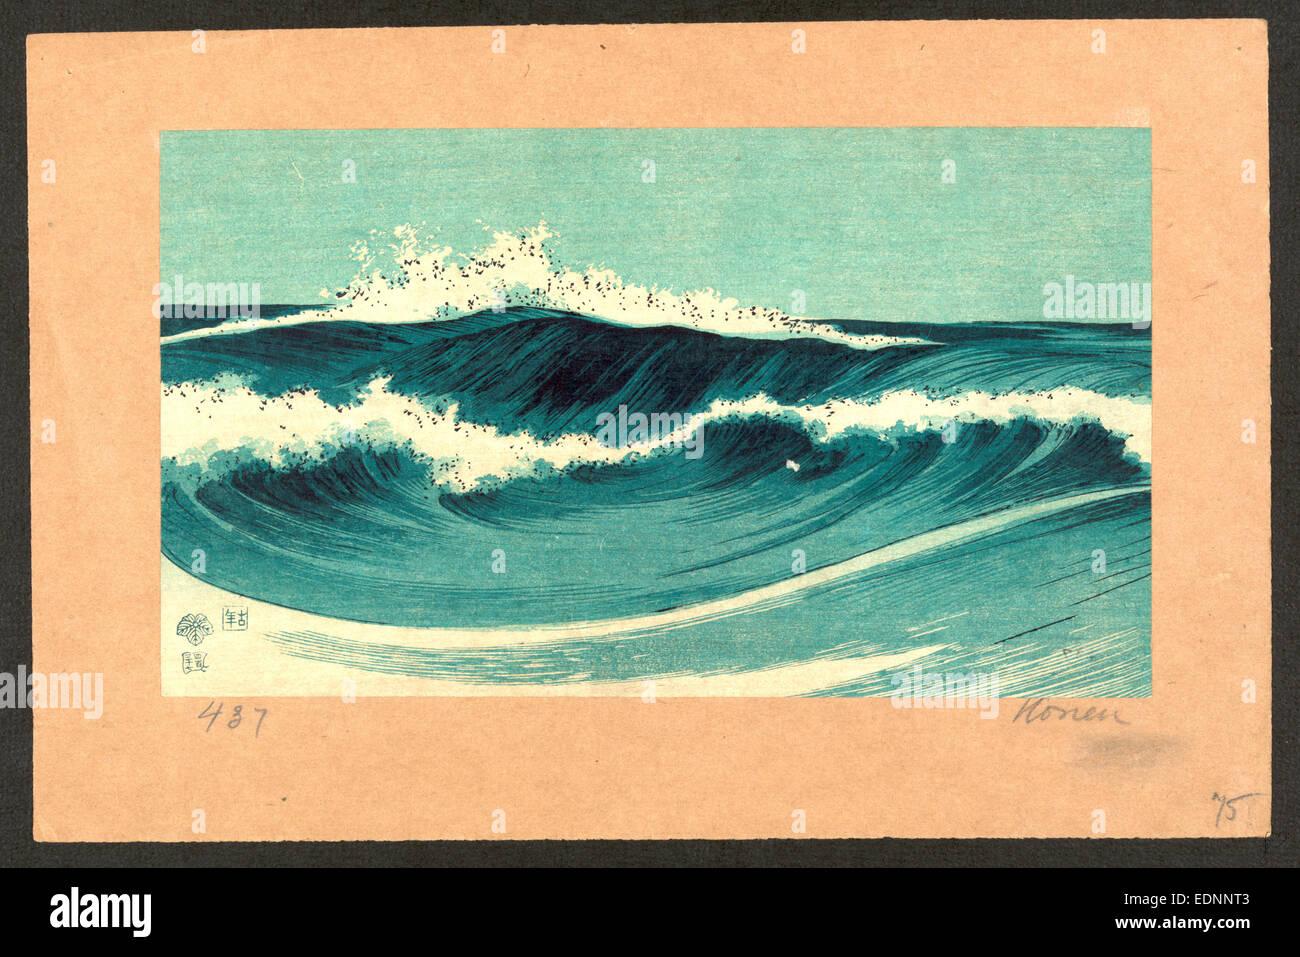 hato zu ocean waves uehara konen 1878 1940 artist between